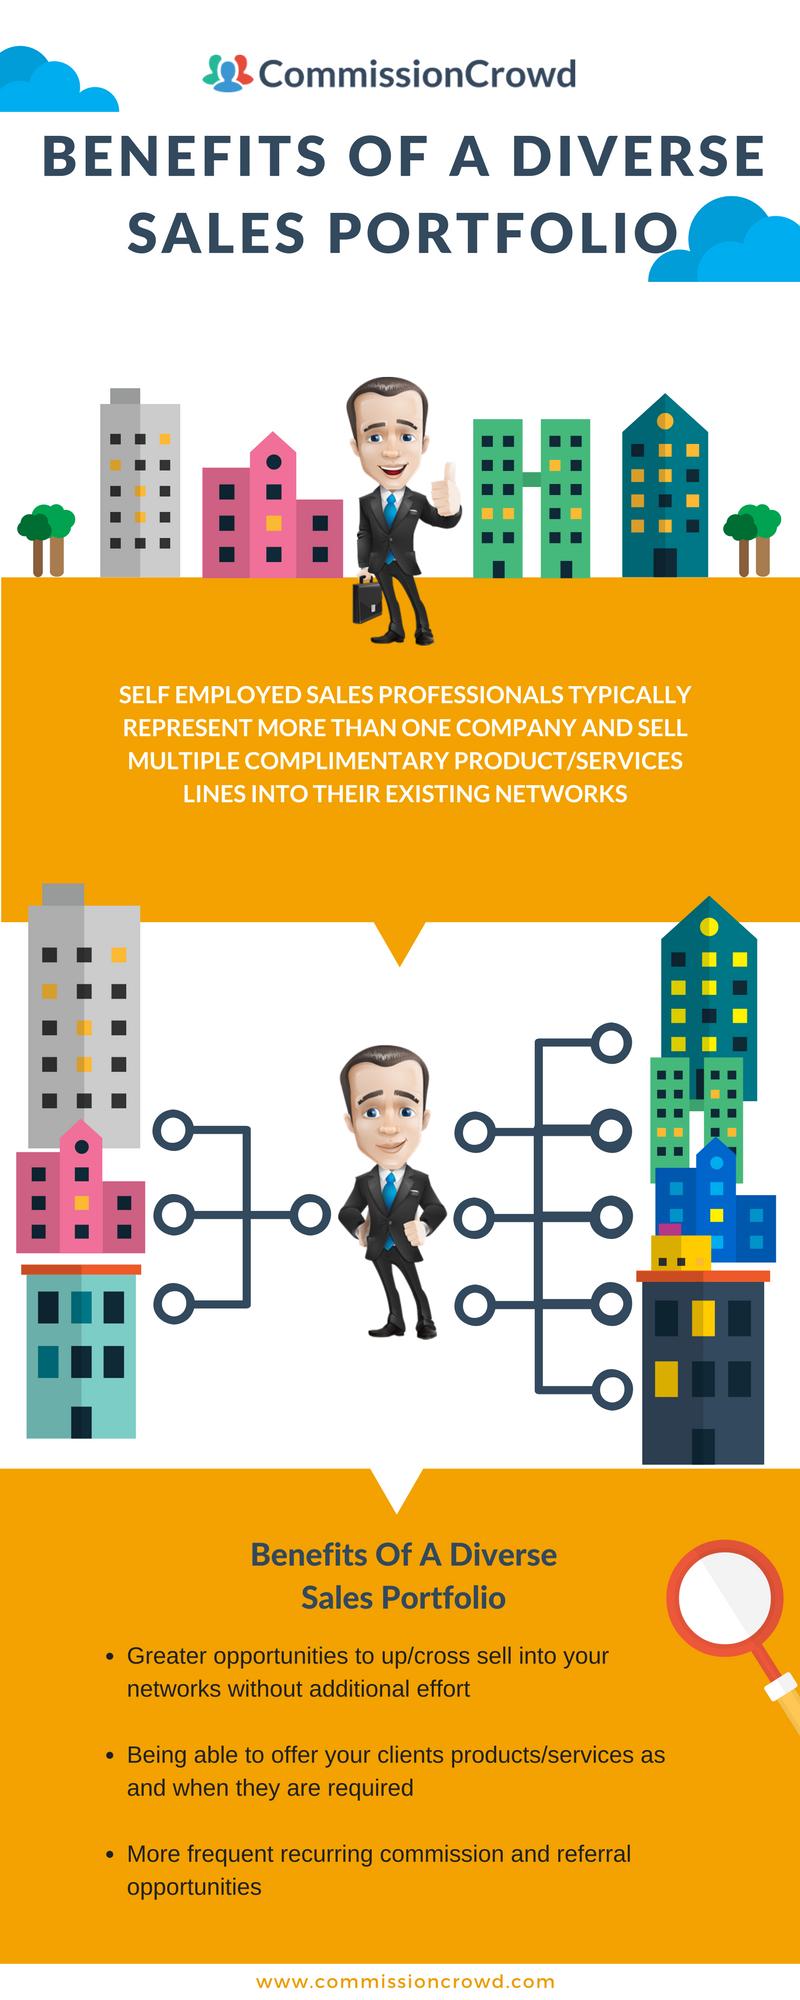 benefits of a diverse sales portfolio infographic